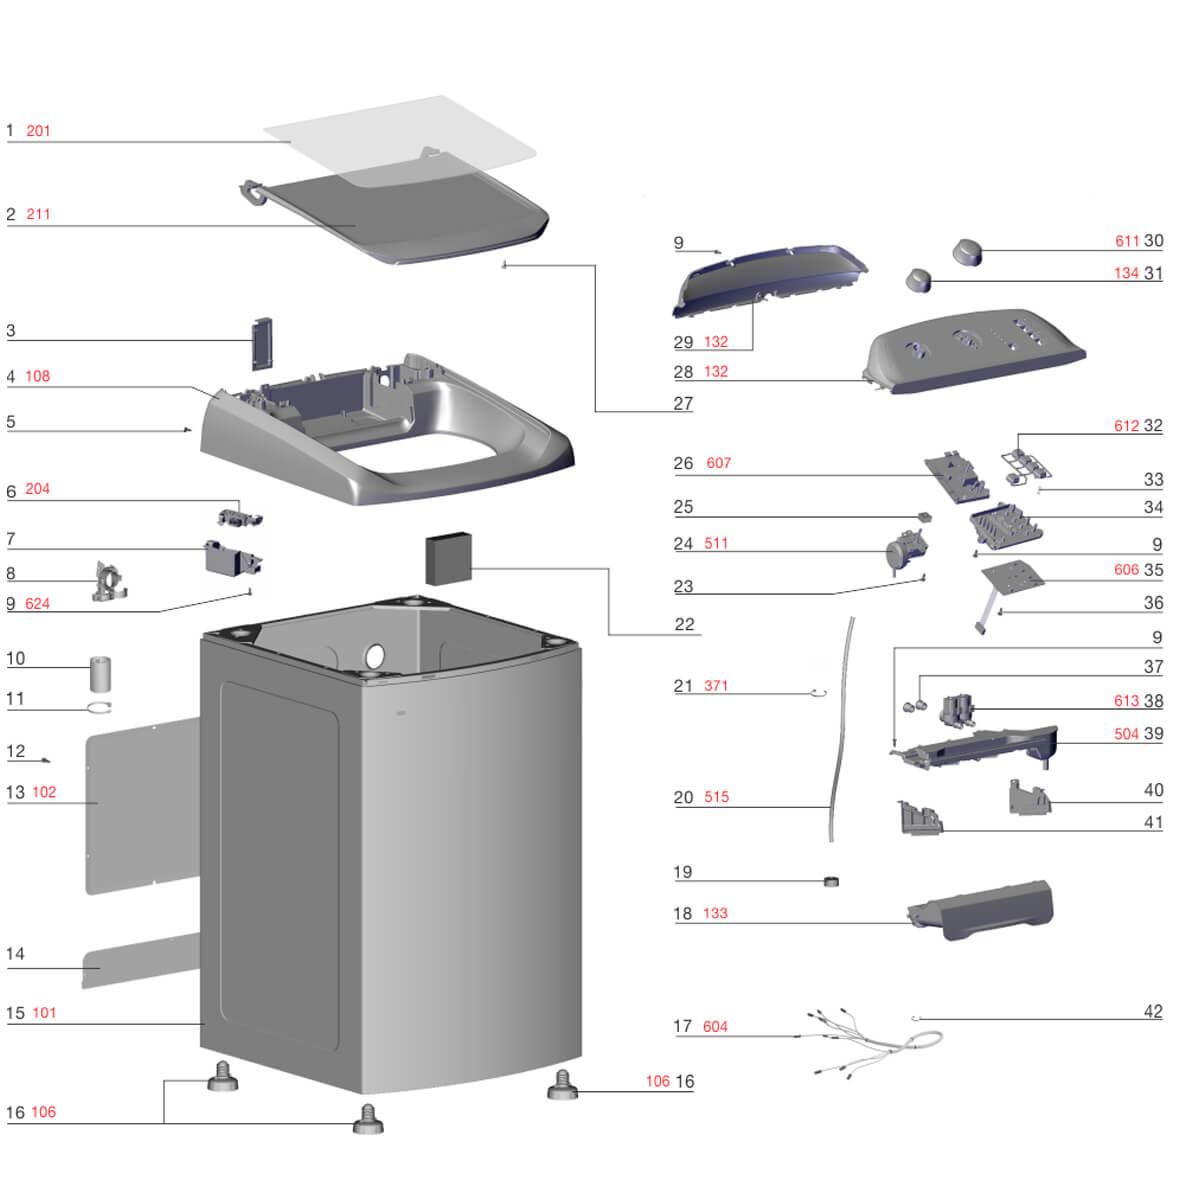 Pressostato 4 Níveis Para Lavadora Lt13b Lt12b Electrolux - 64503116